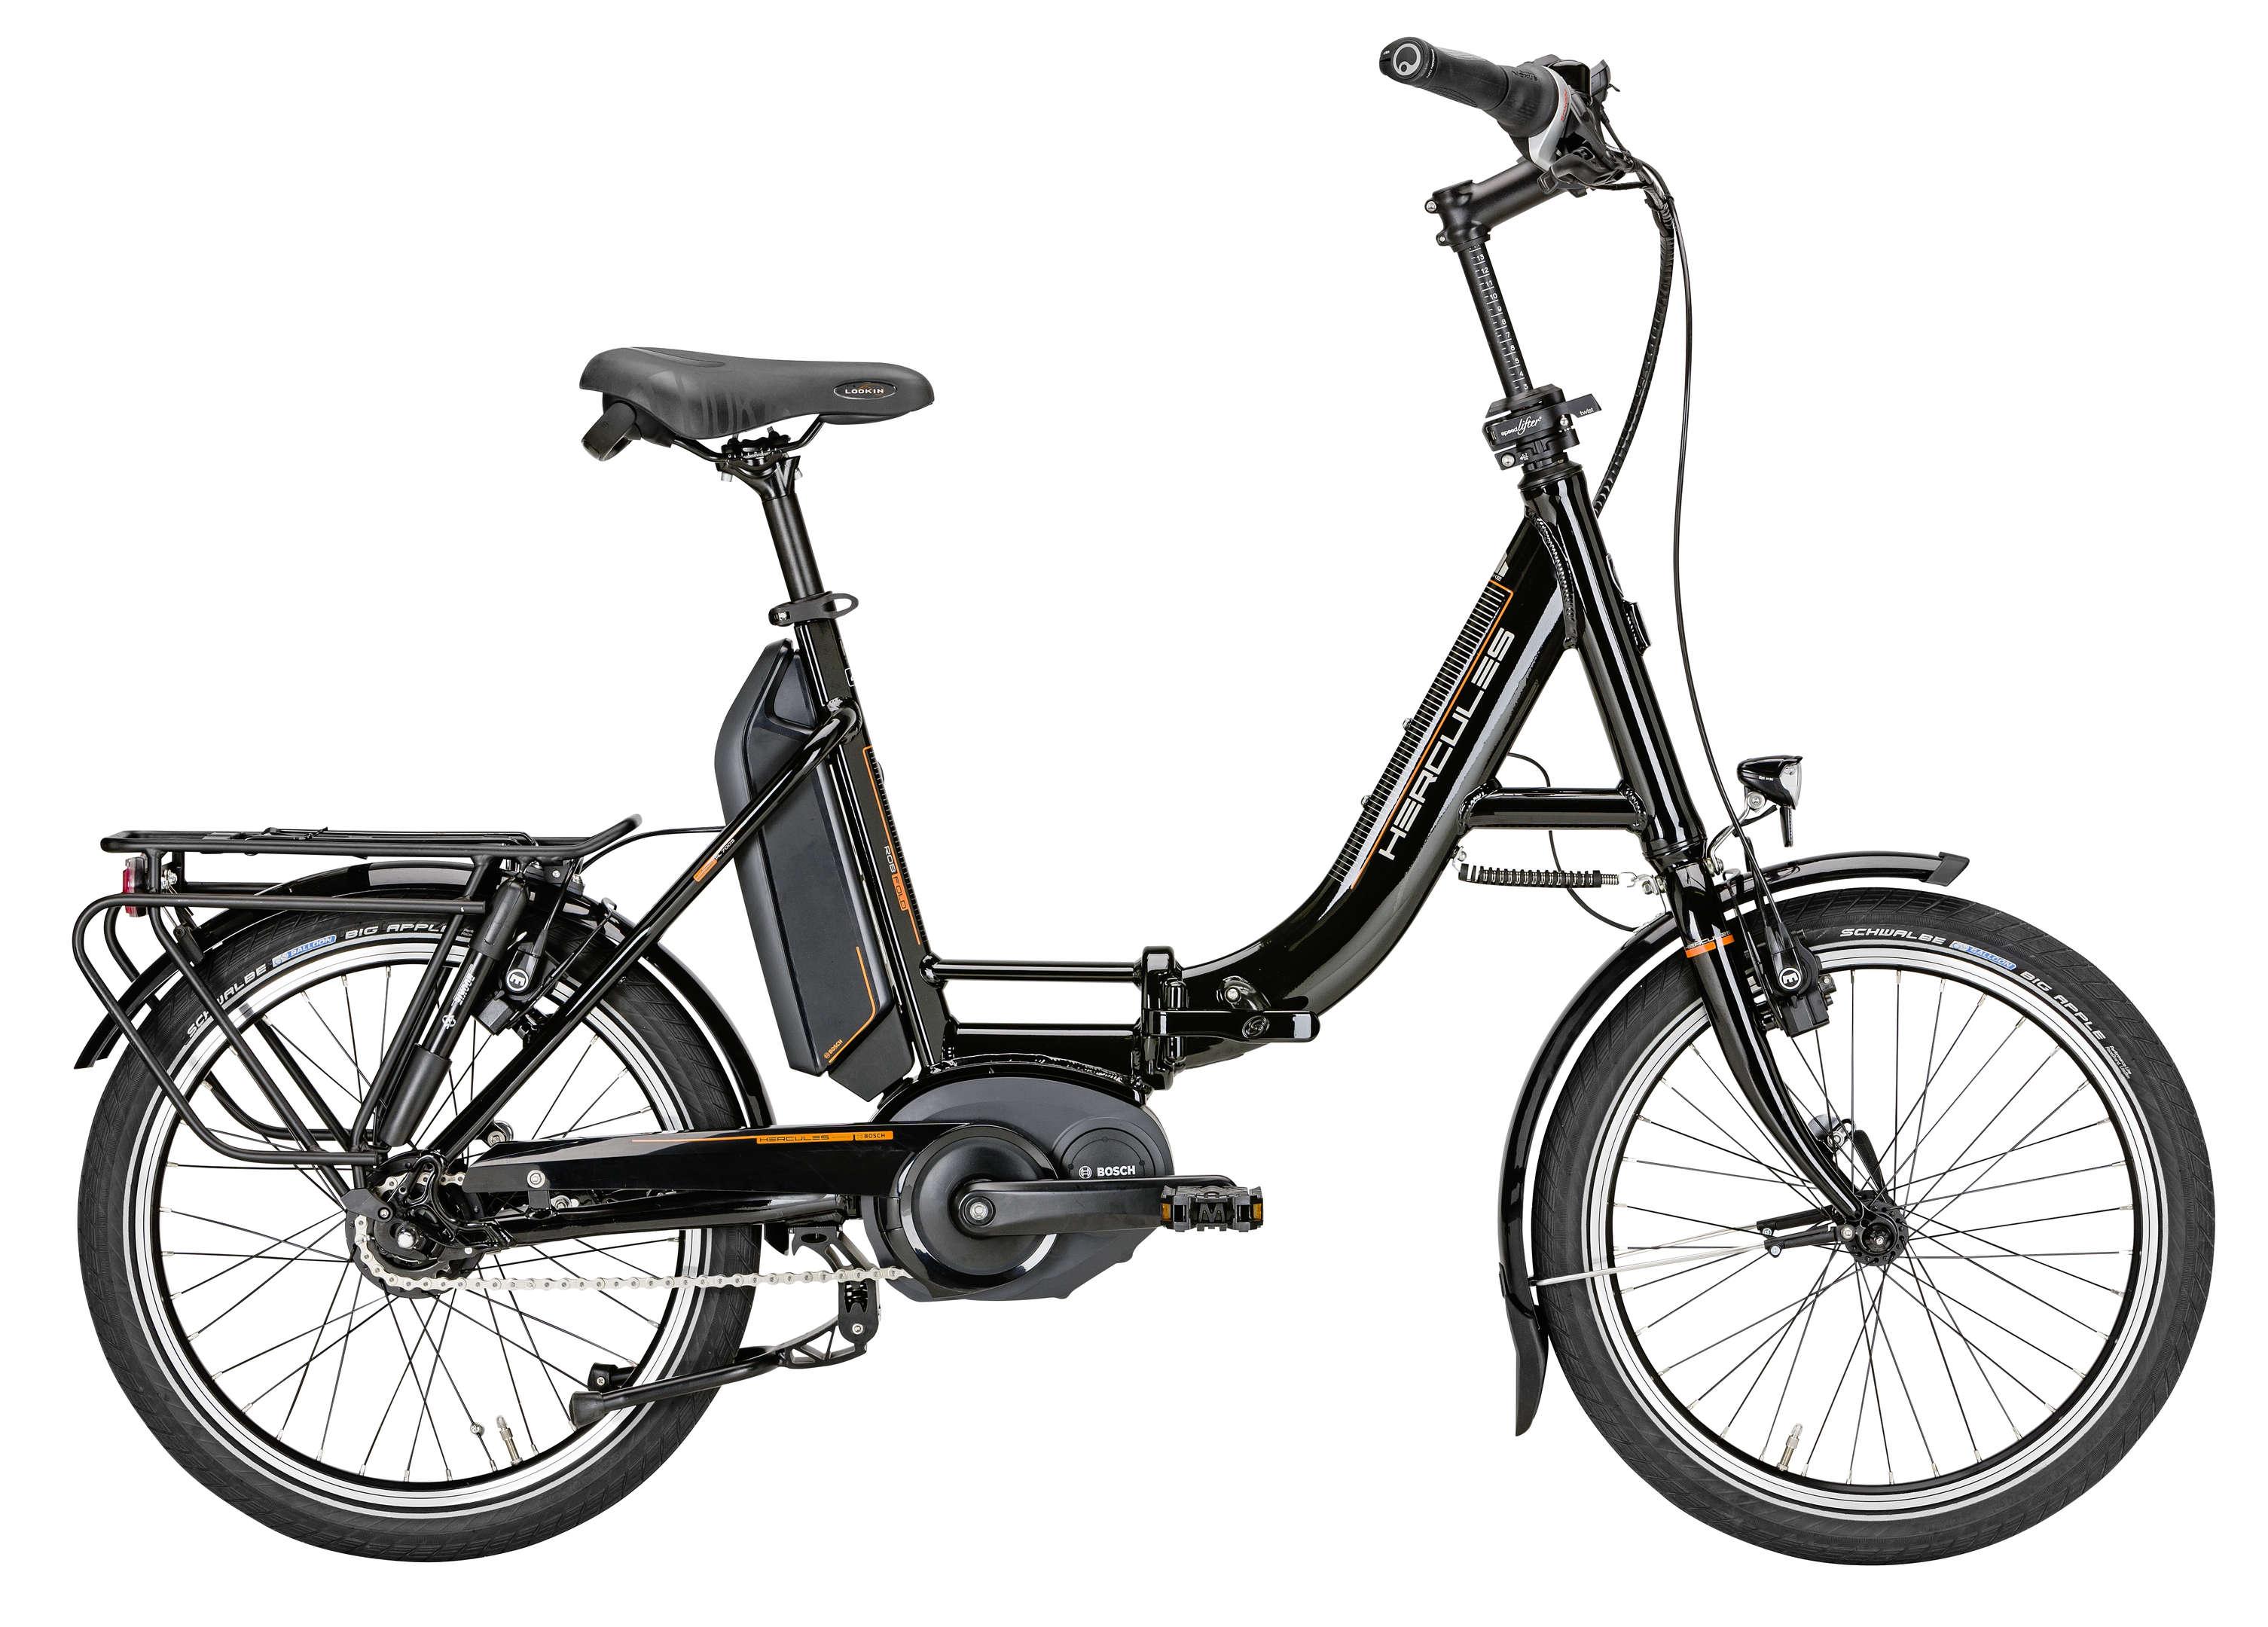 hercules e bike rob fold r8 eurorad bikeleasingeurorad. Black Bedroom Furniture Sets. Home Design Ideas